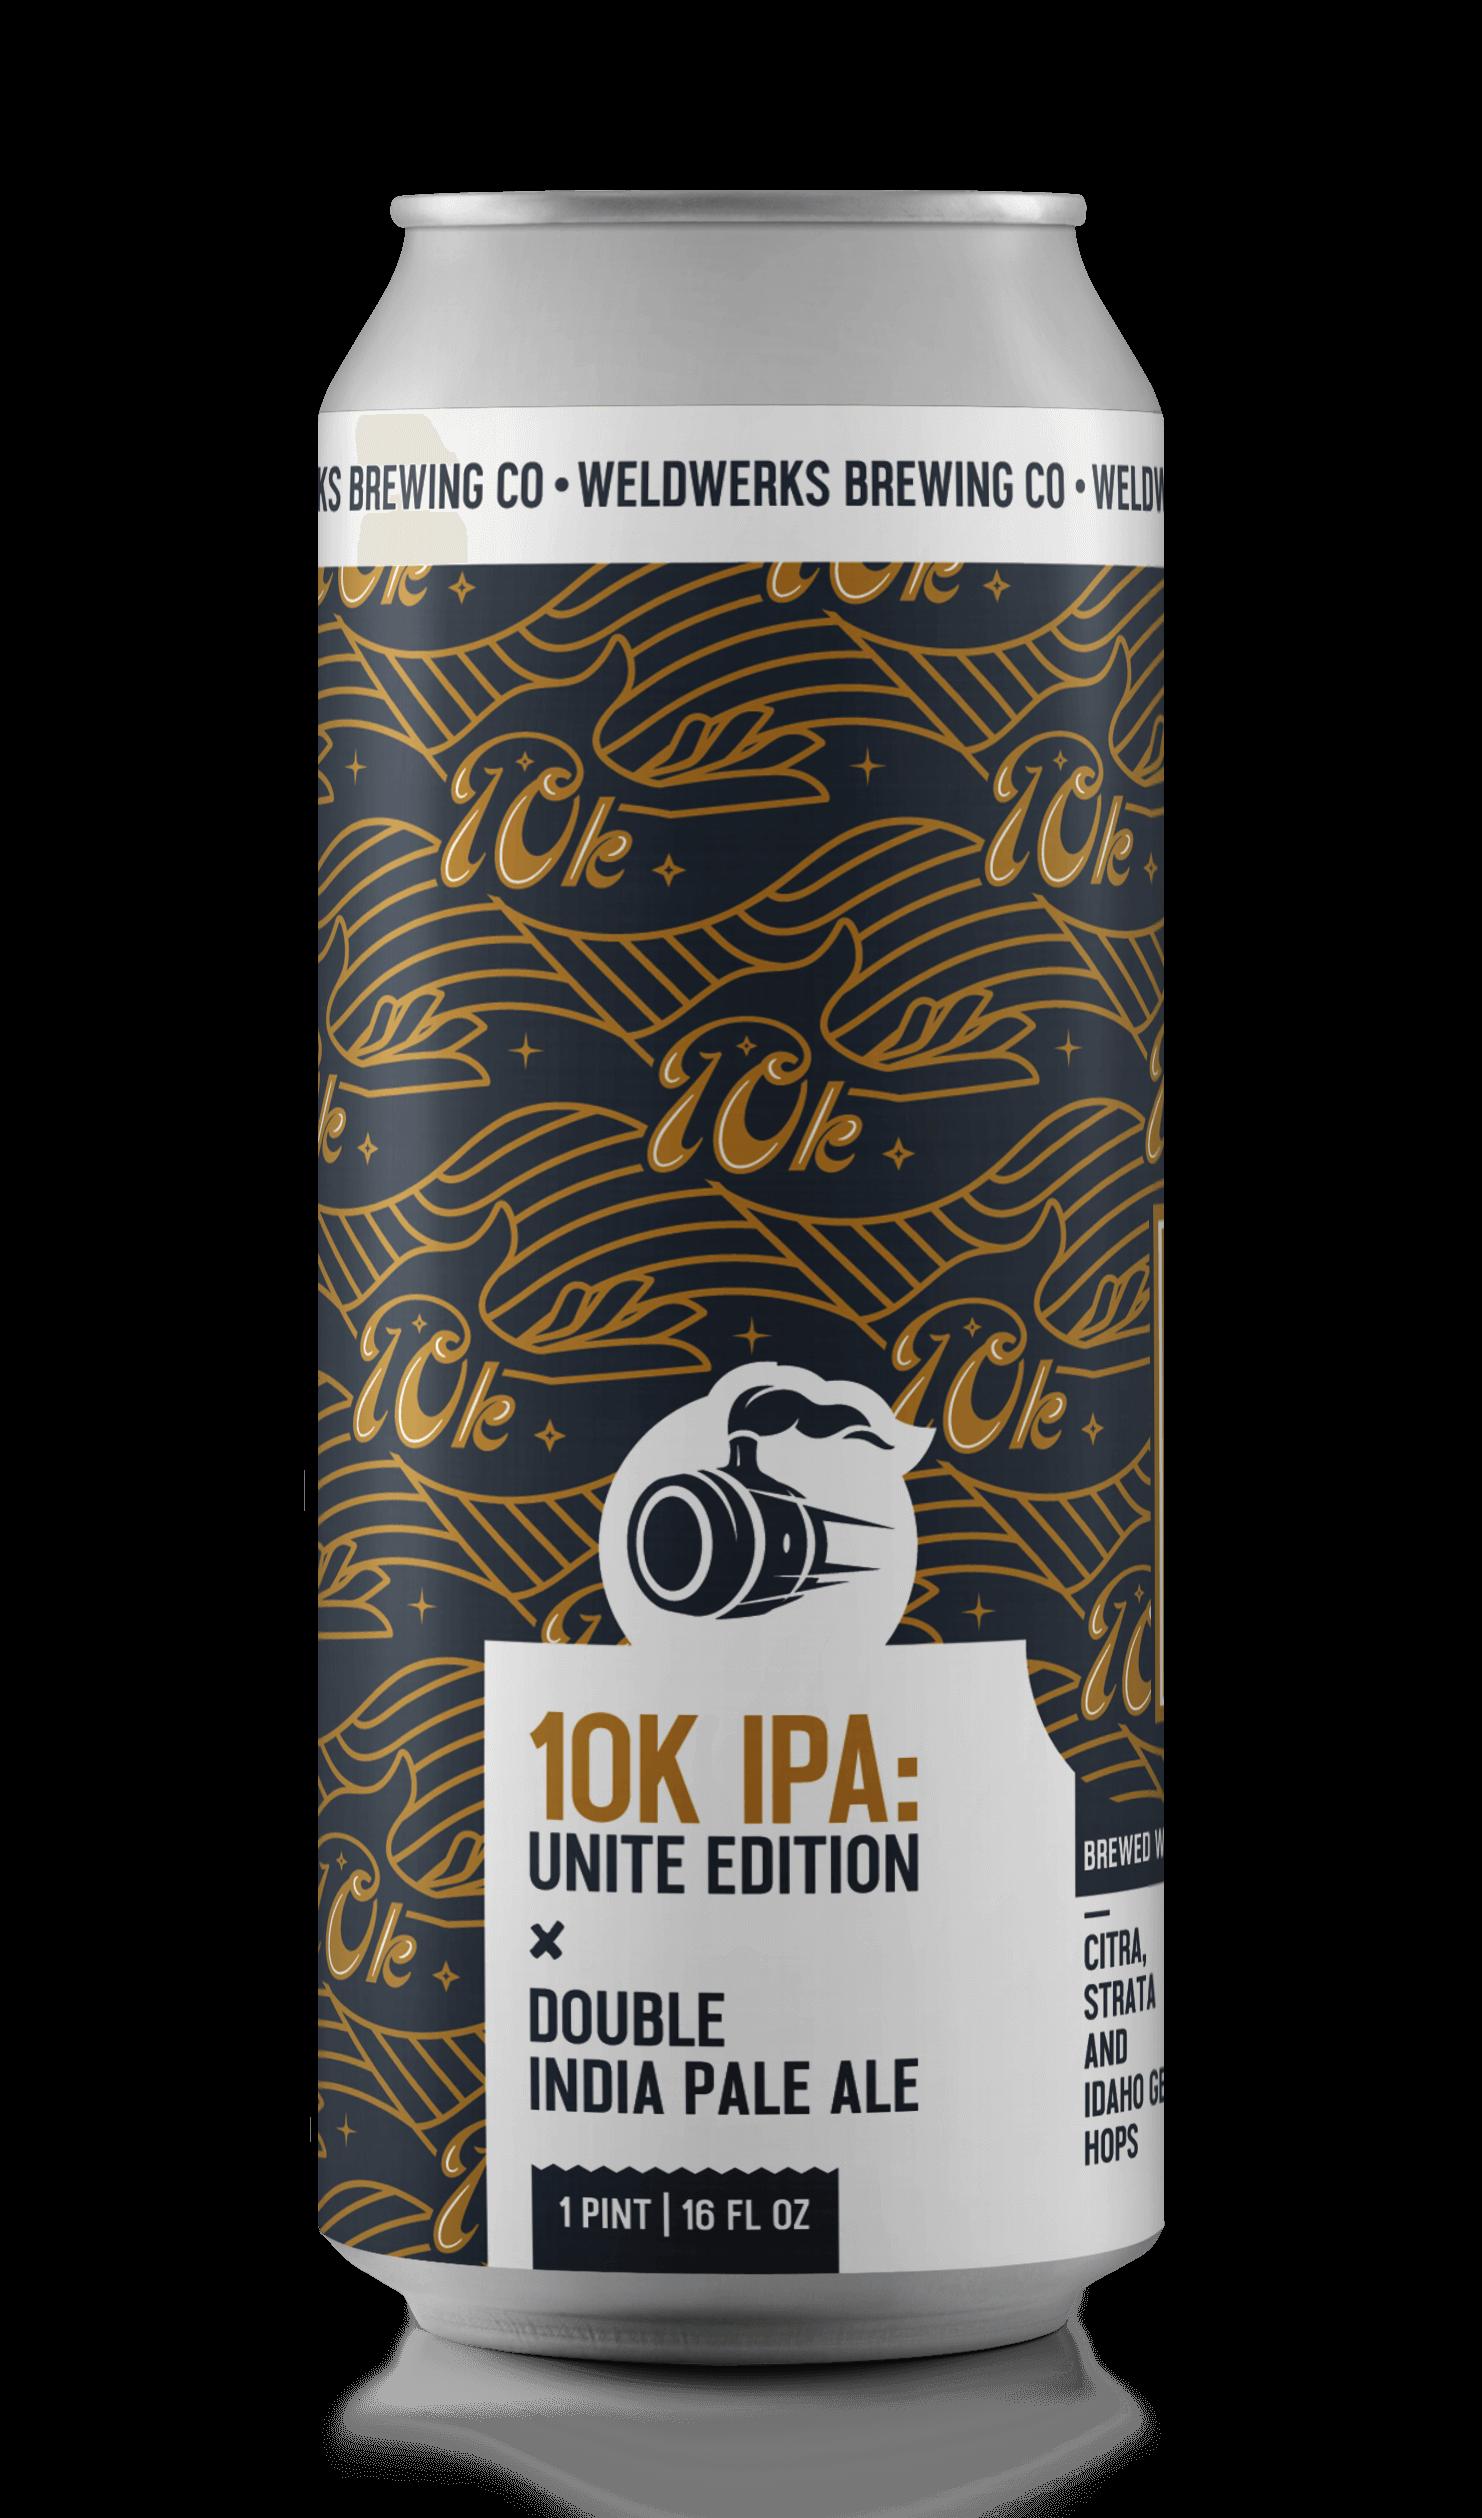 10k IPA: Unite Edition